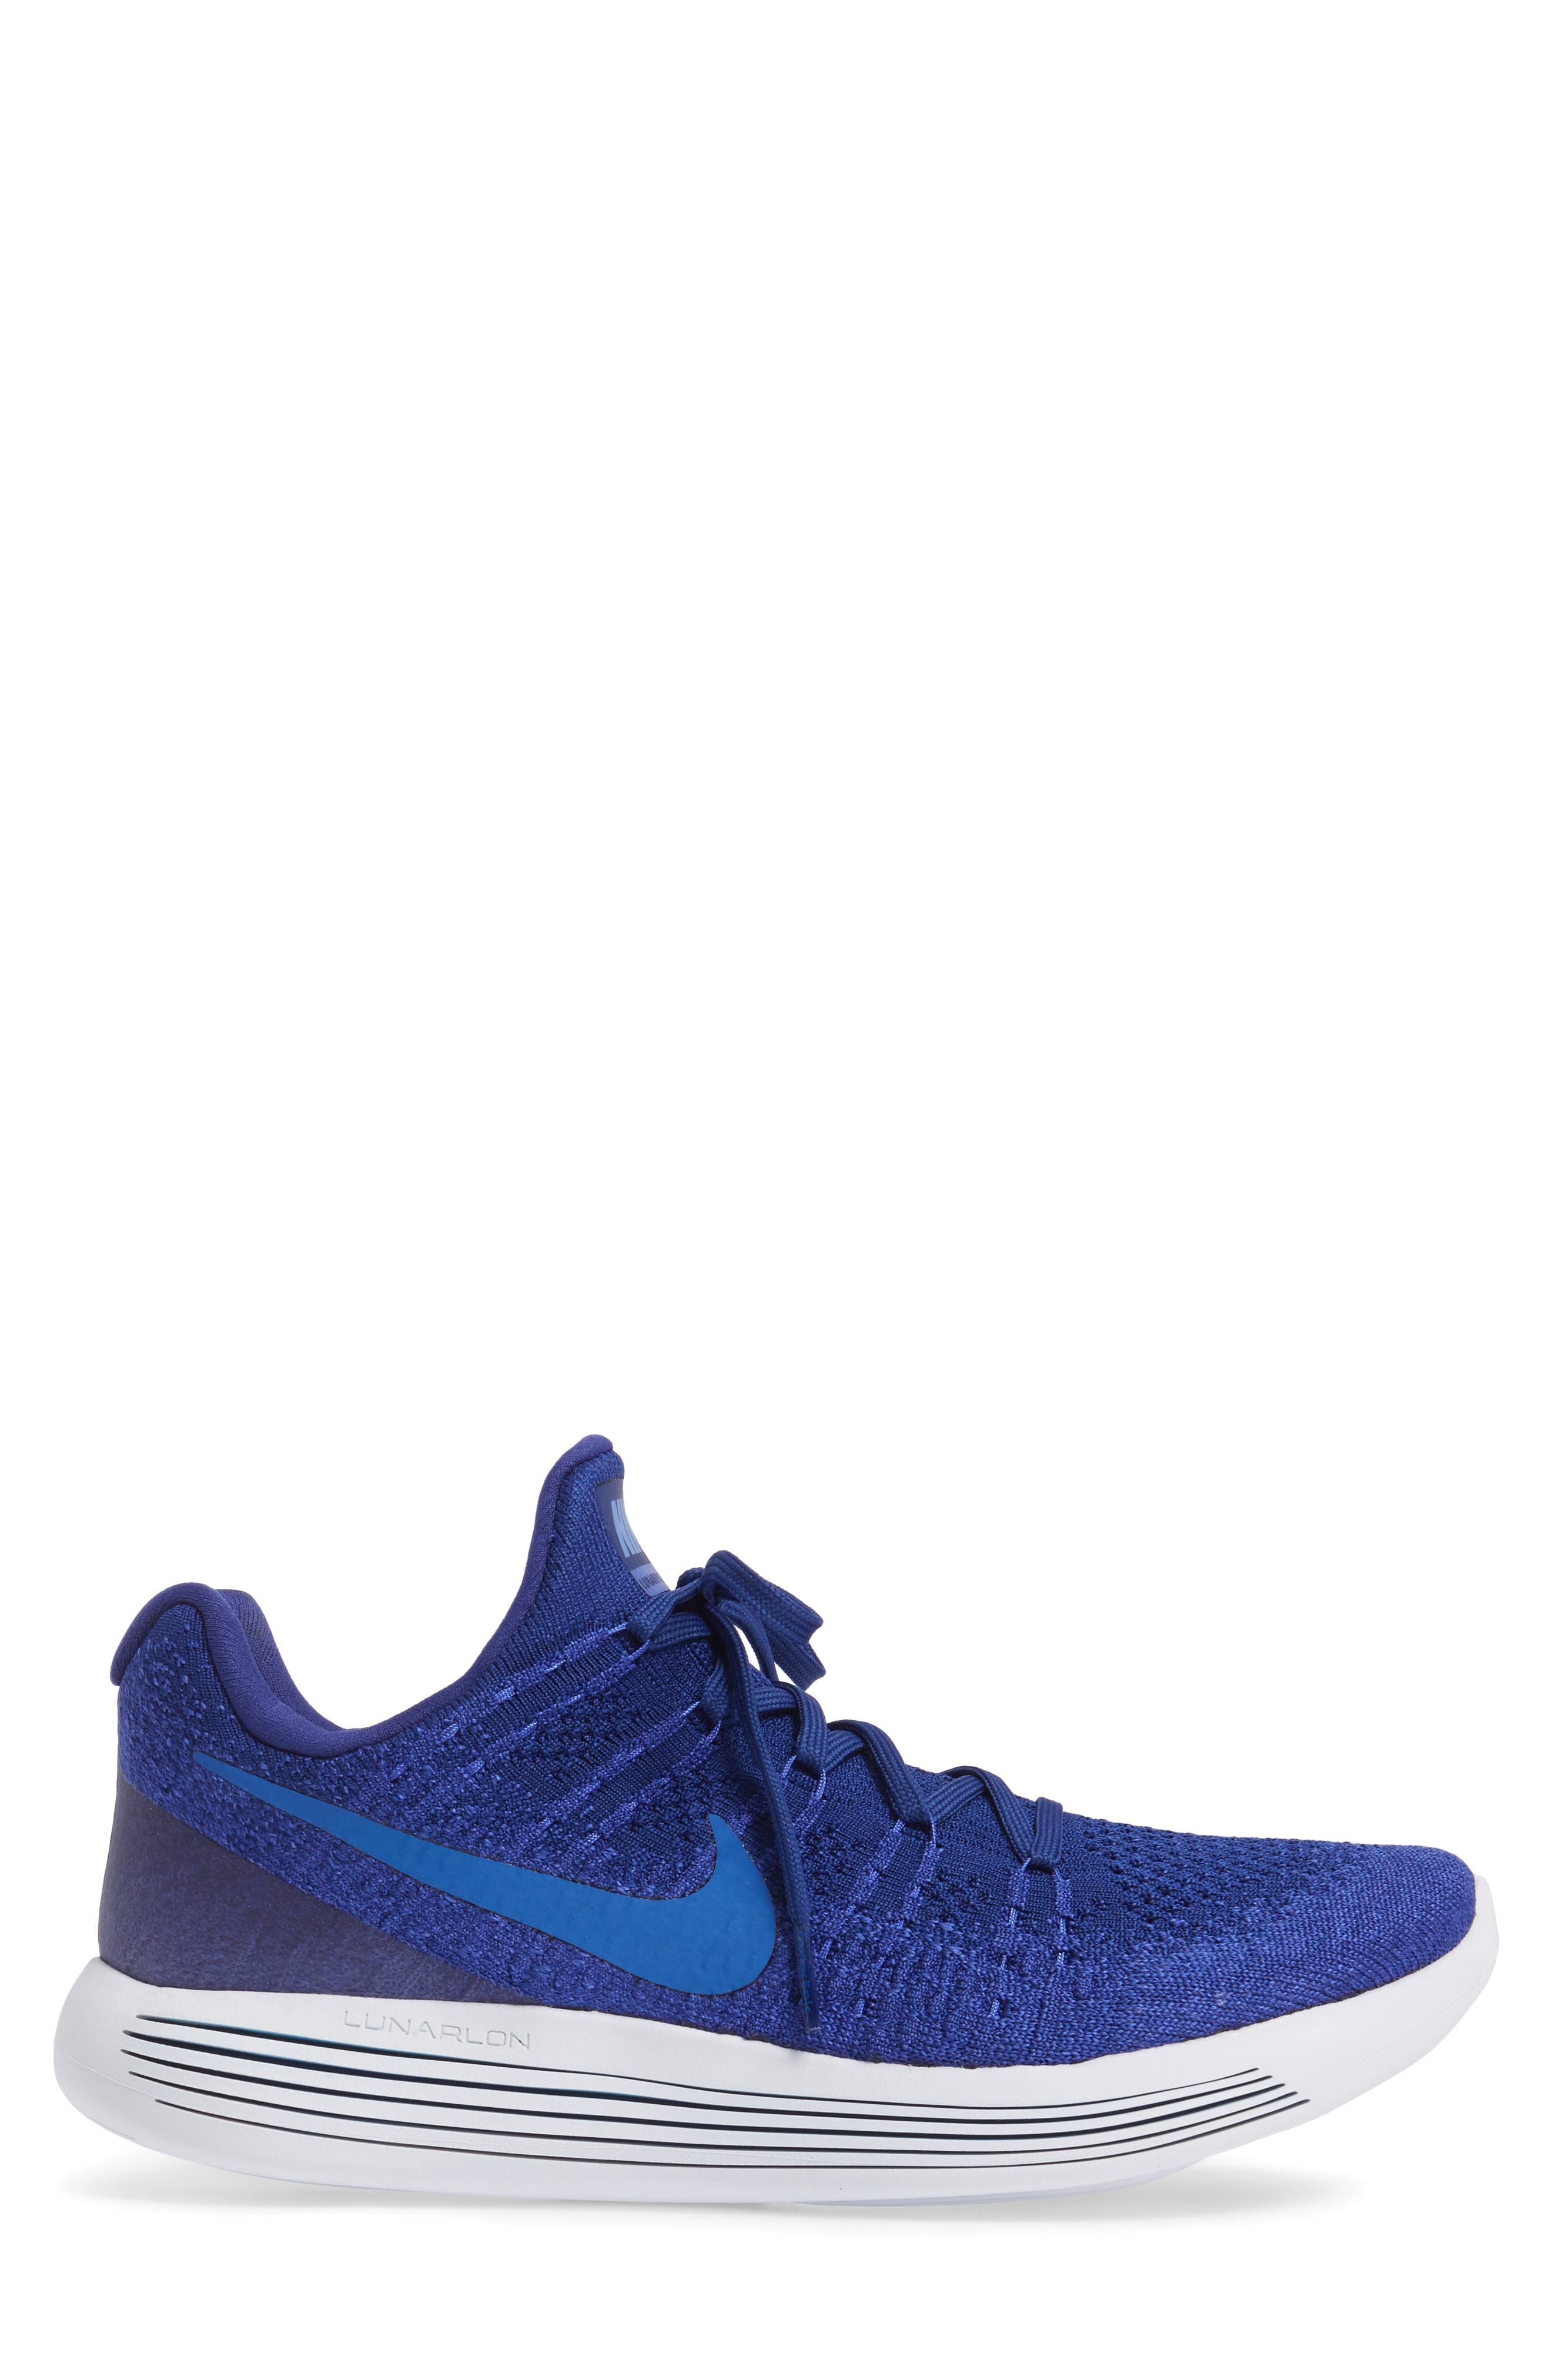 Flyknit 2 LunarEpic Running Shoe,                             Alternate thumbnail 3, color,                             Royal Blue/ Blue